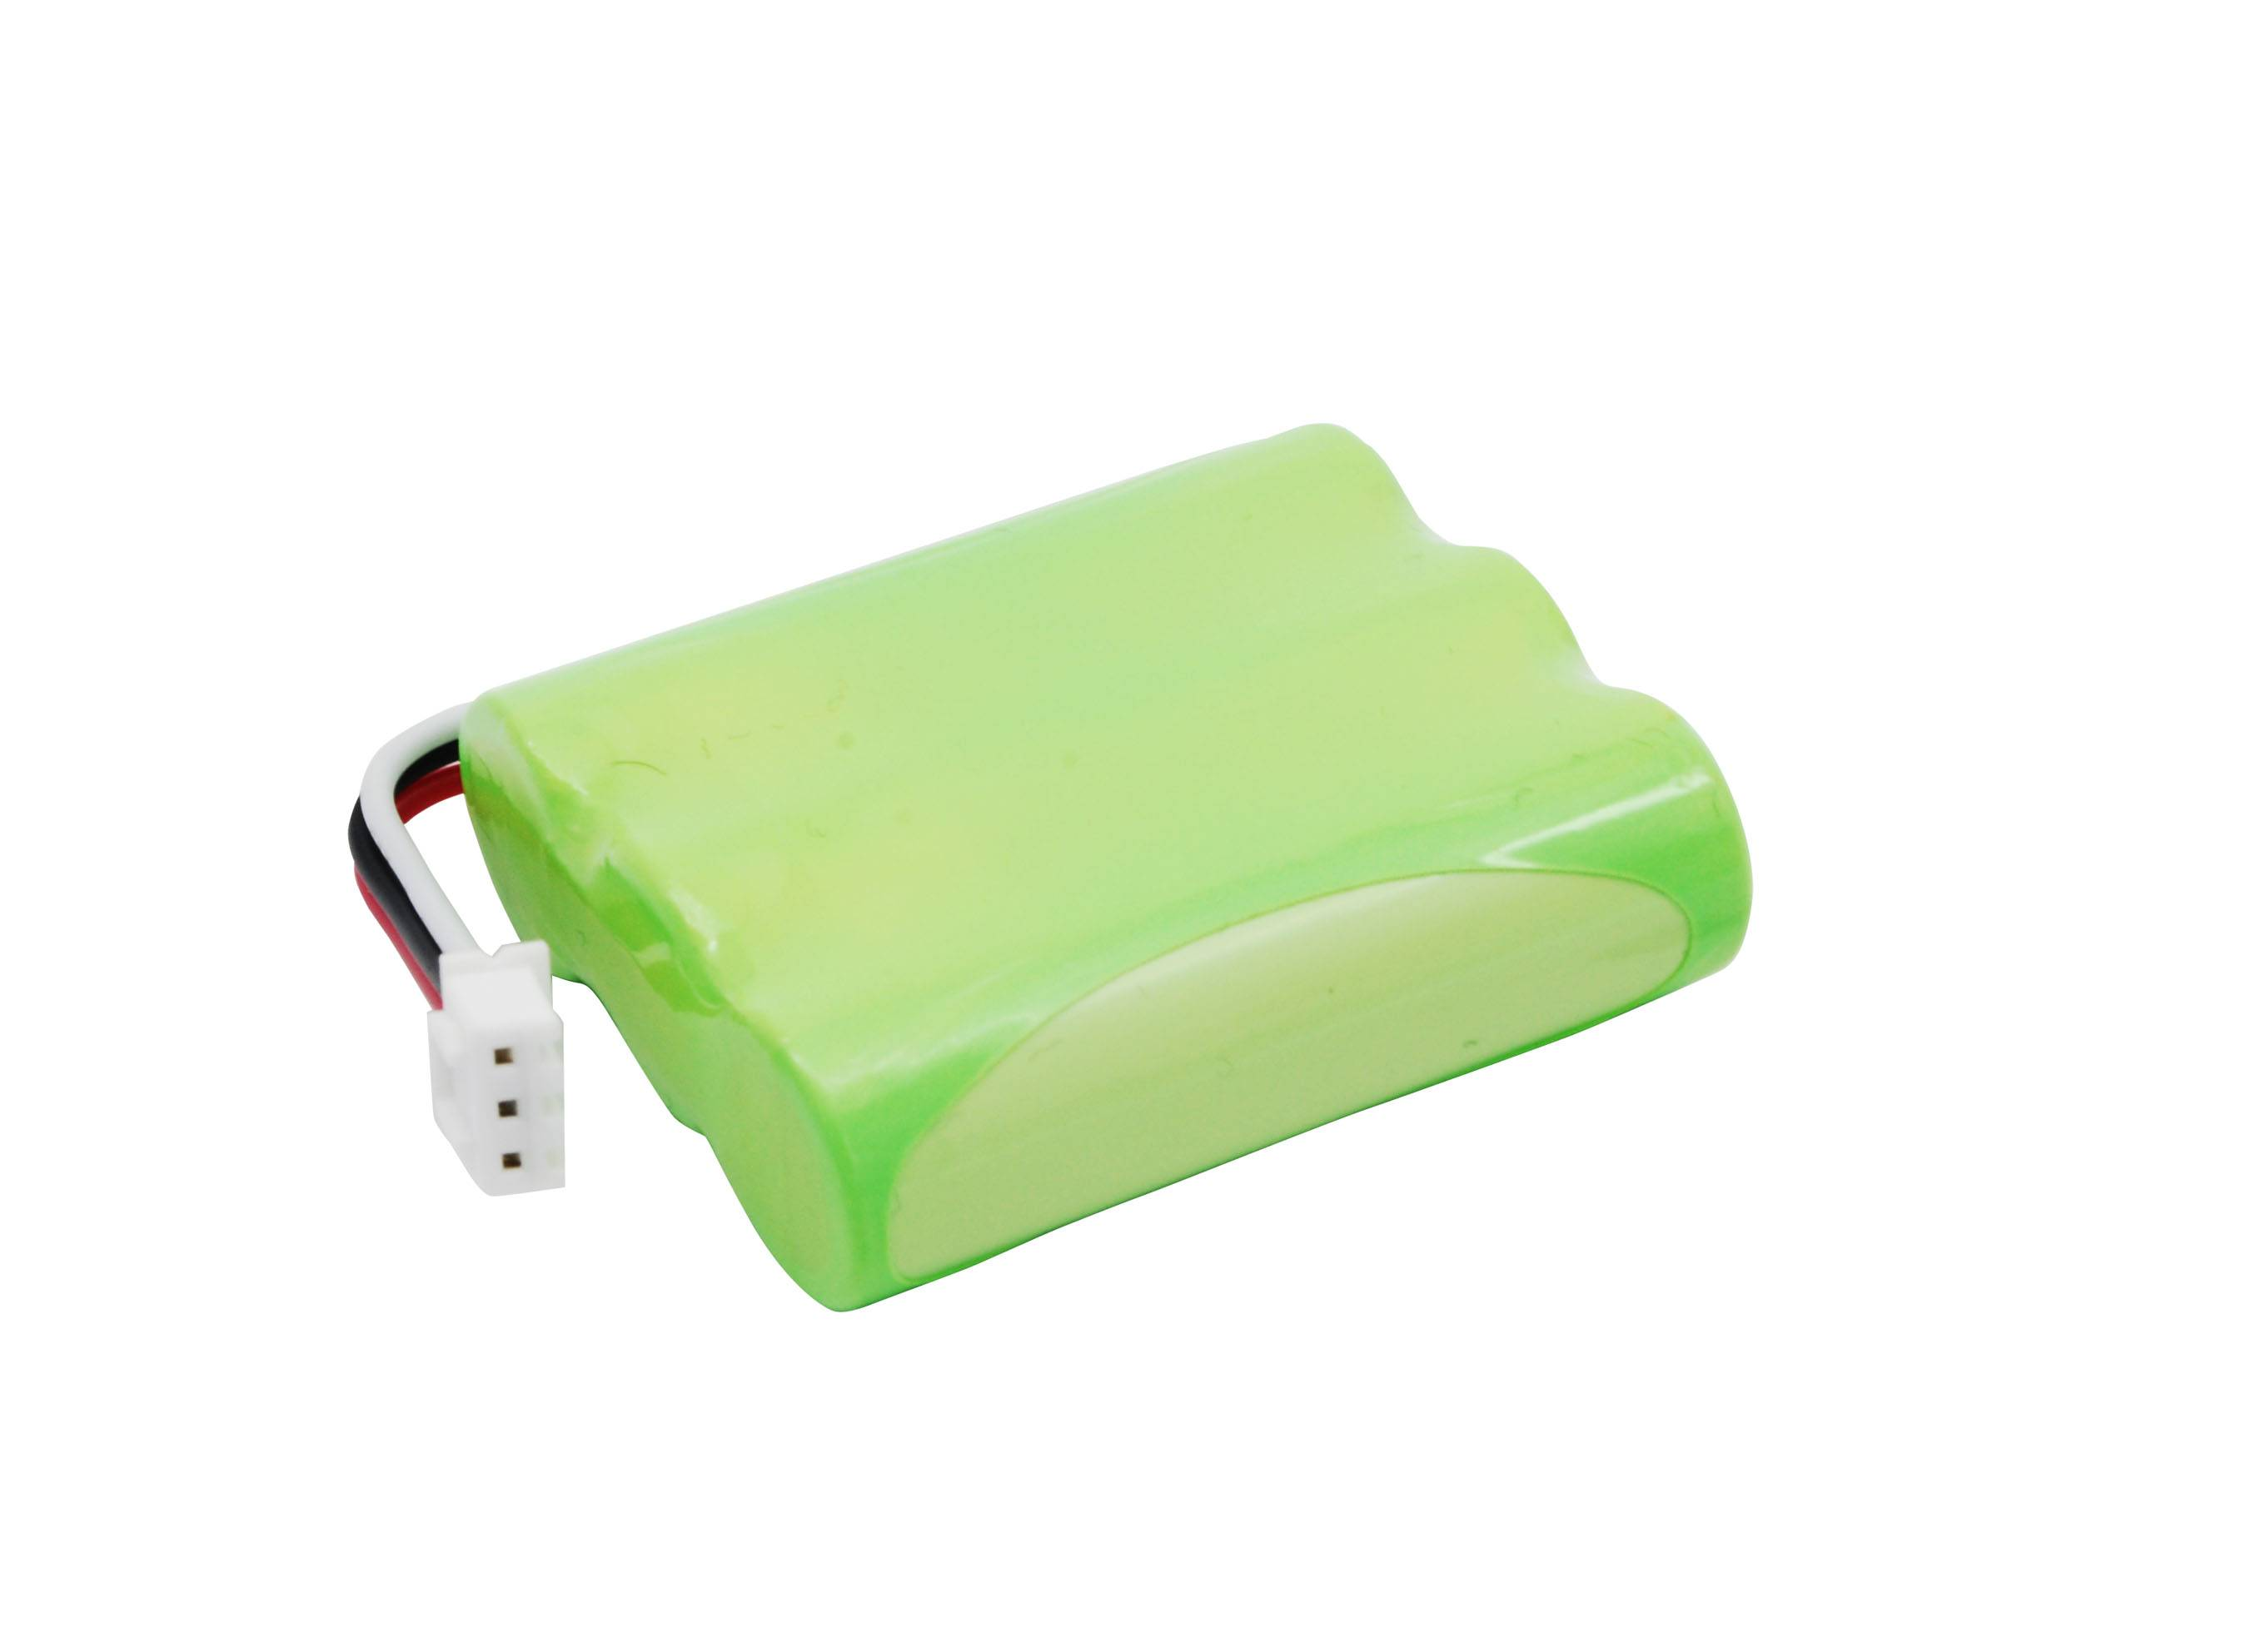 Huawei Batteri til Huawei ETS2022 3.6V 2000mAh Ni-Mh